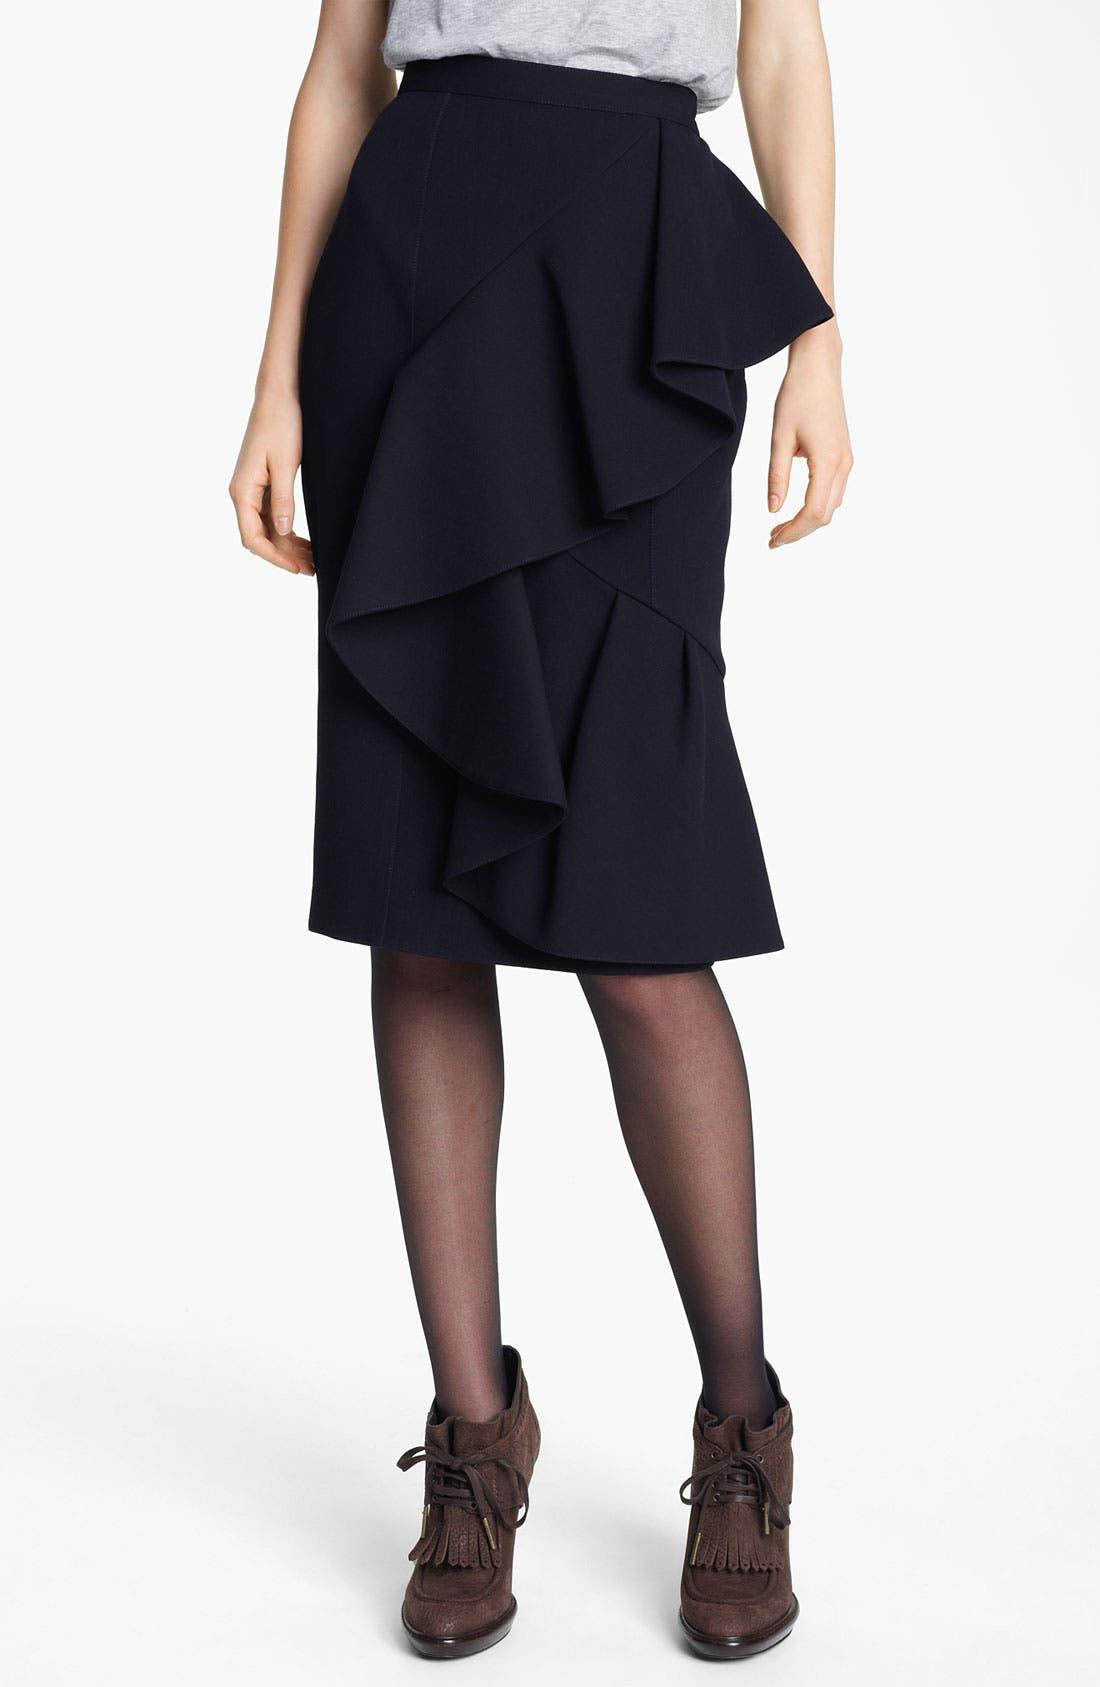 Alternate Image 1 Selected - Burberry Prorsum Ruffled Skirt